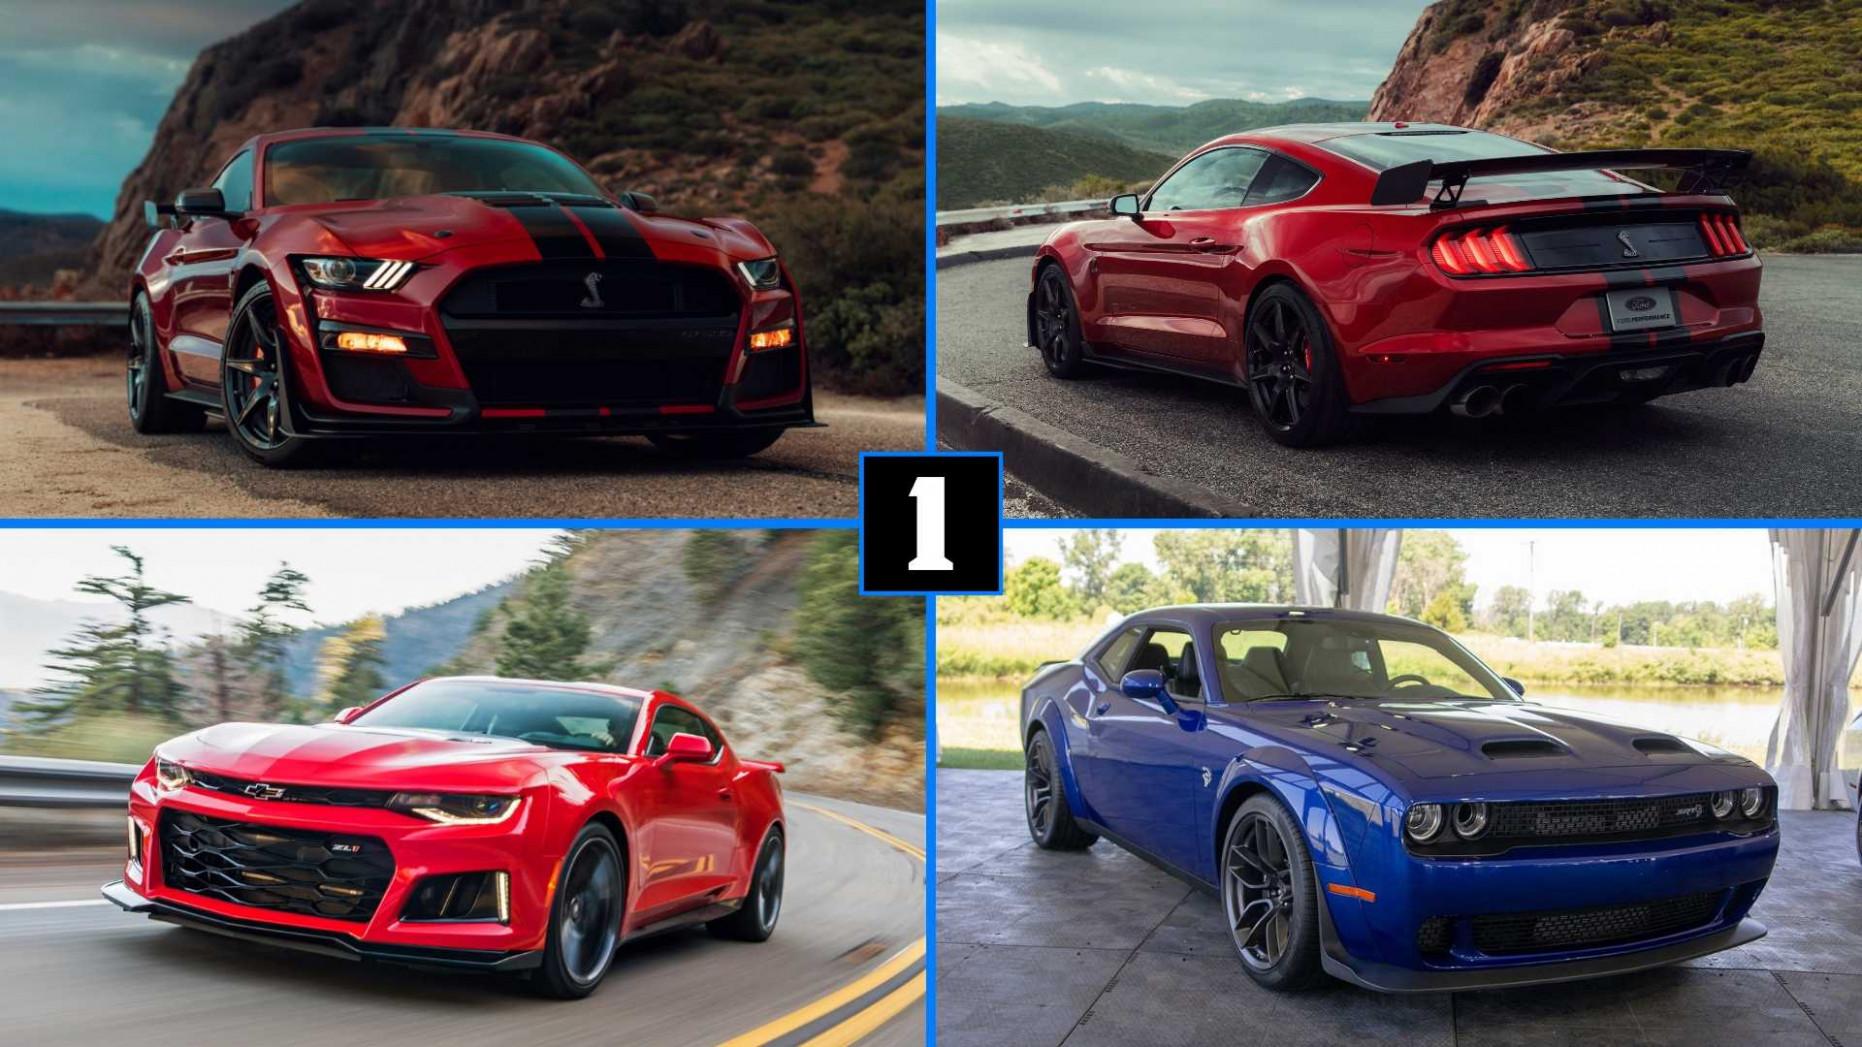 New Review 2022 Mustang Gt500 Vs Dodge Demon